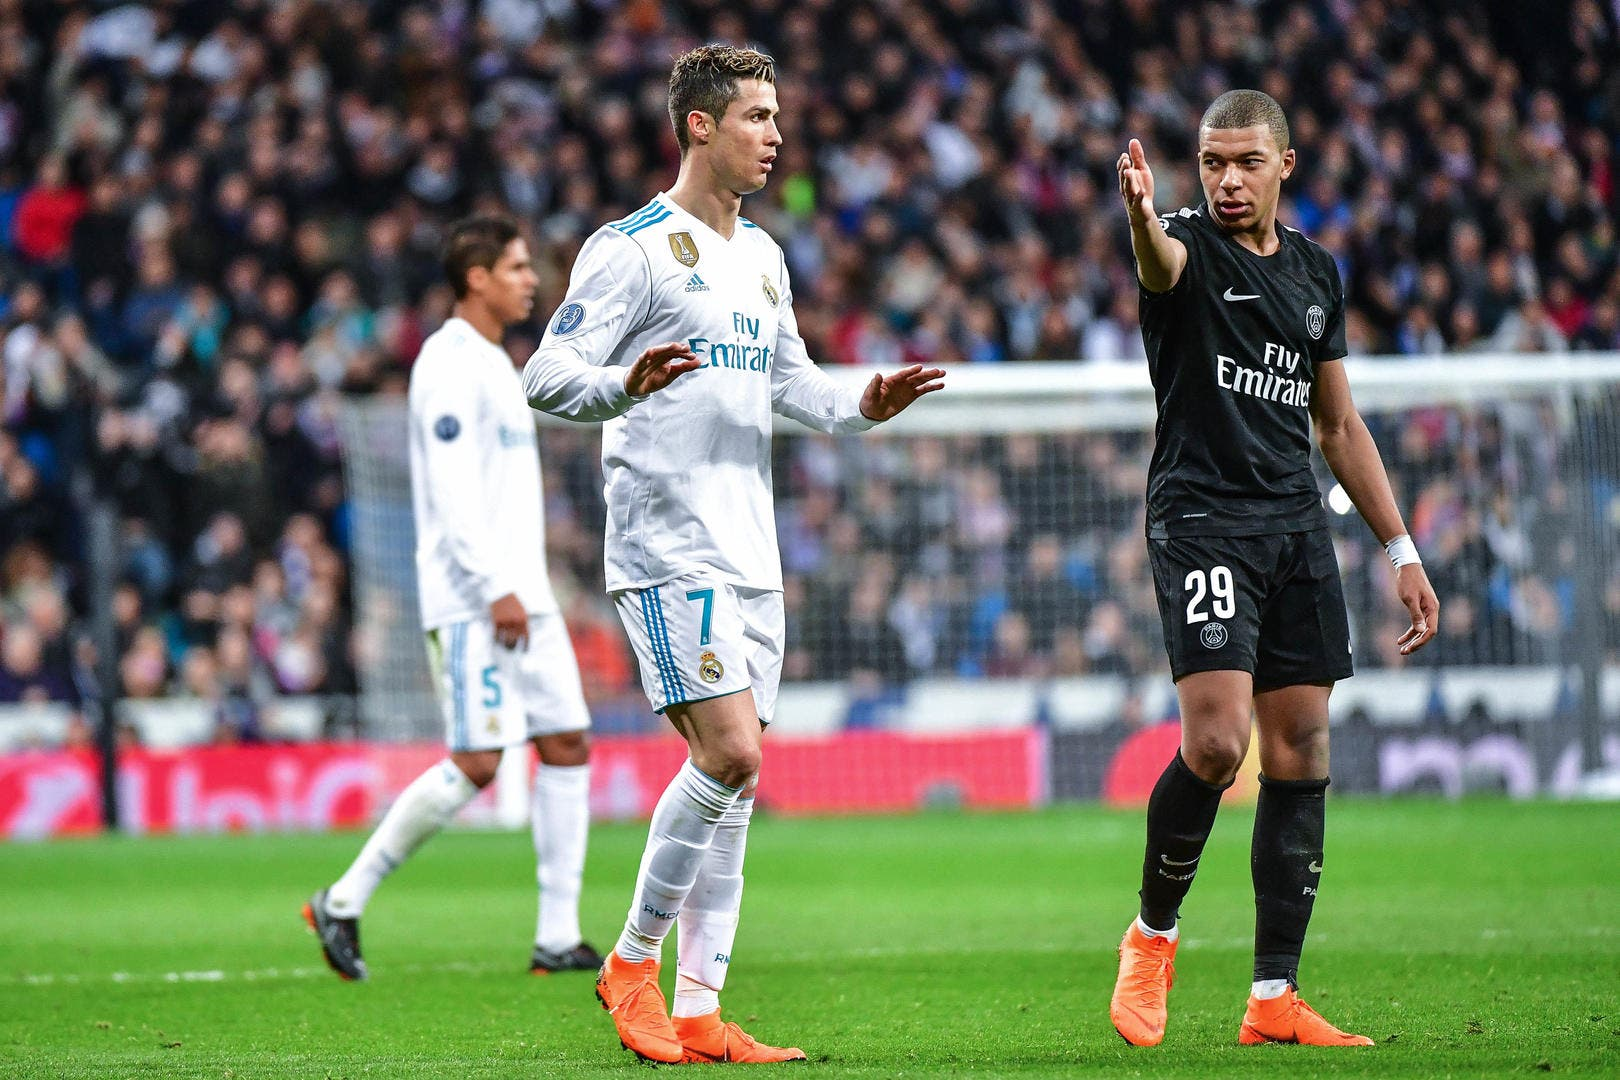 PSG : Mbappé va imiter Cristiano Ronaldo, le Qatar est prévenu